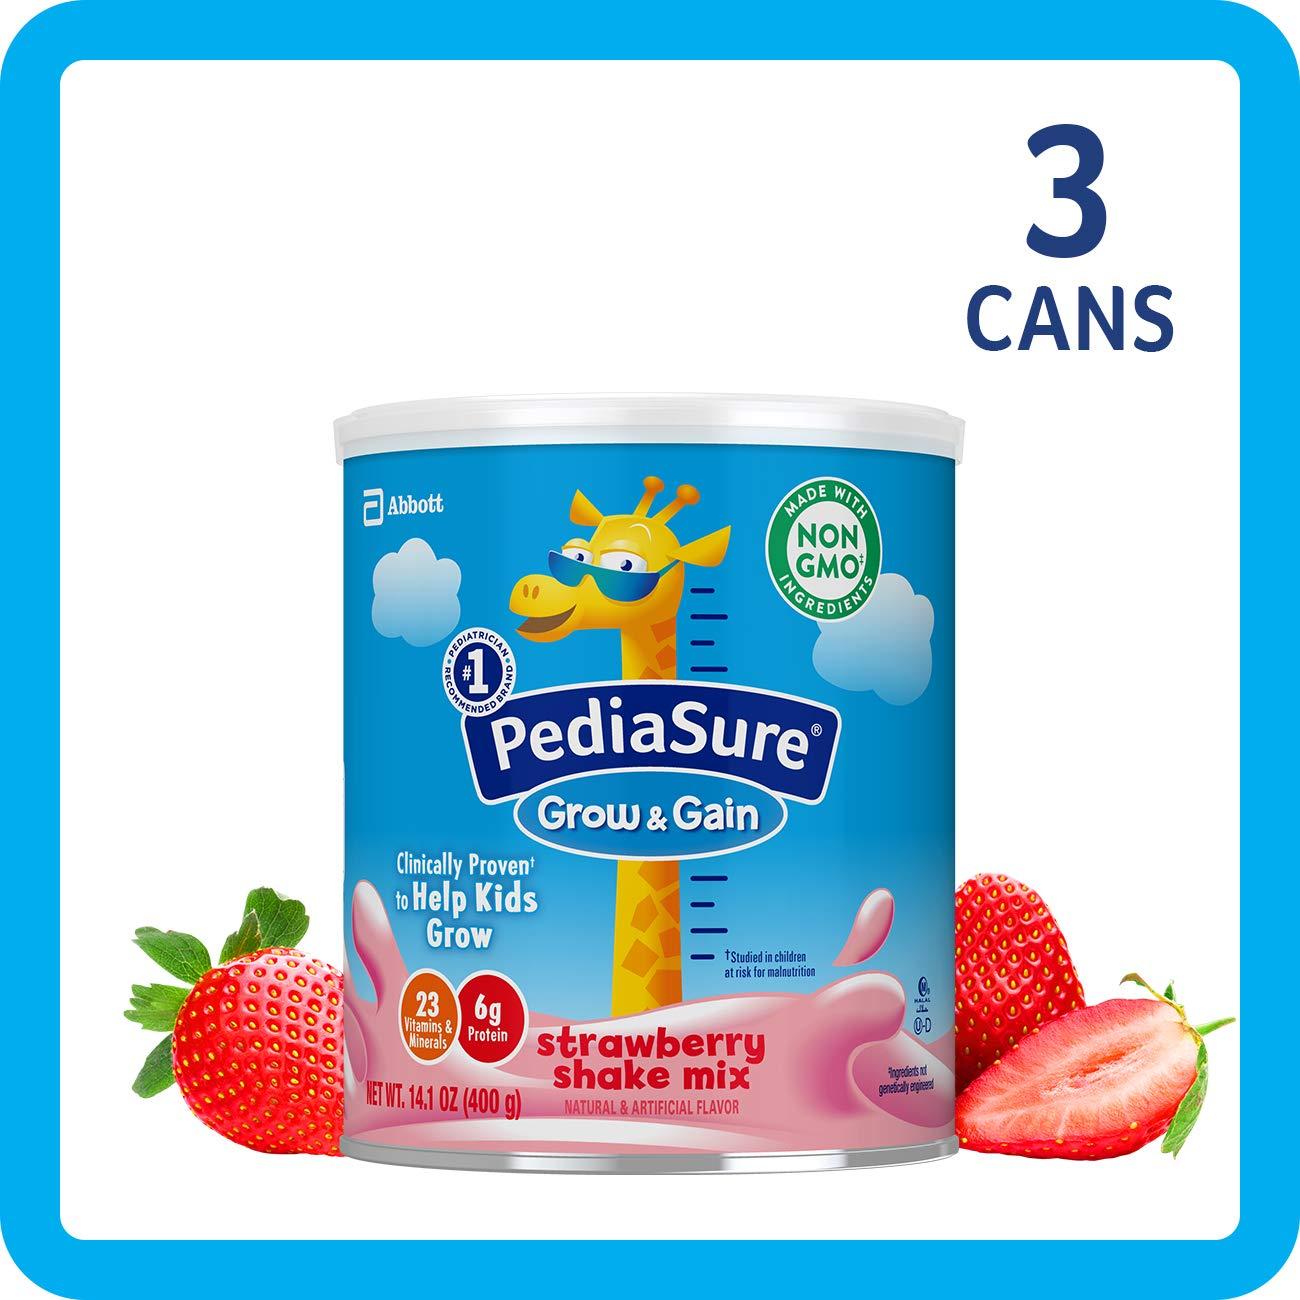 Pediasure Grow & Gain Non-Gmo Shake Mix powder, nutritional Shake for Kids, With Protein, Dha, antioxidants, & Vitamins & Minerals, Strawberry, 14.1 Oz, 3Count